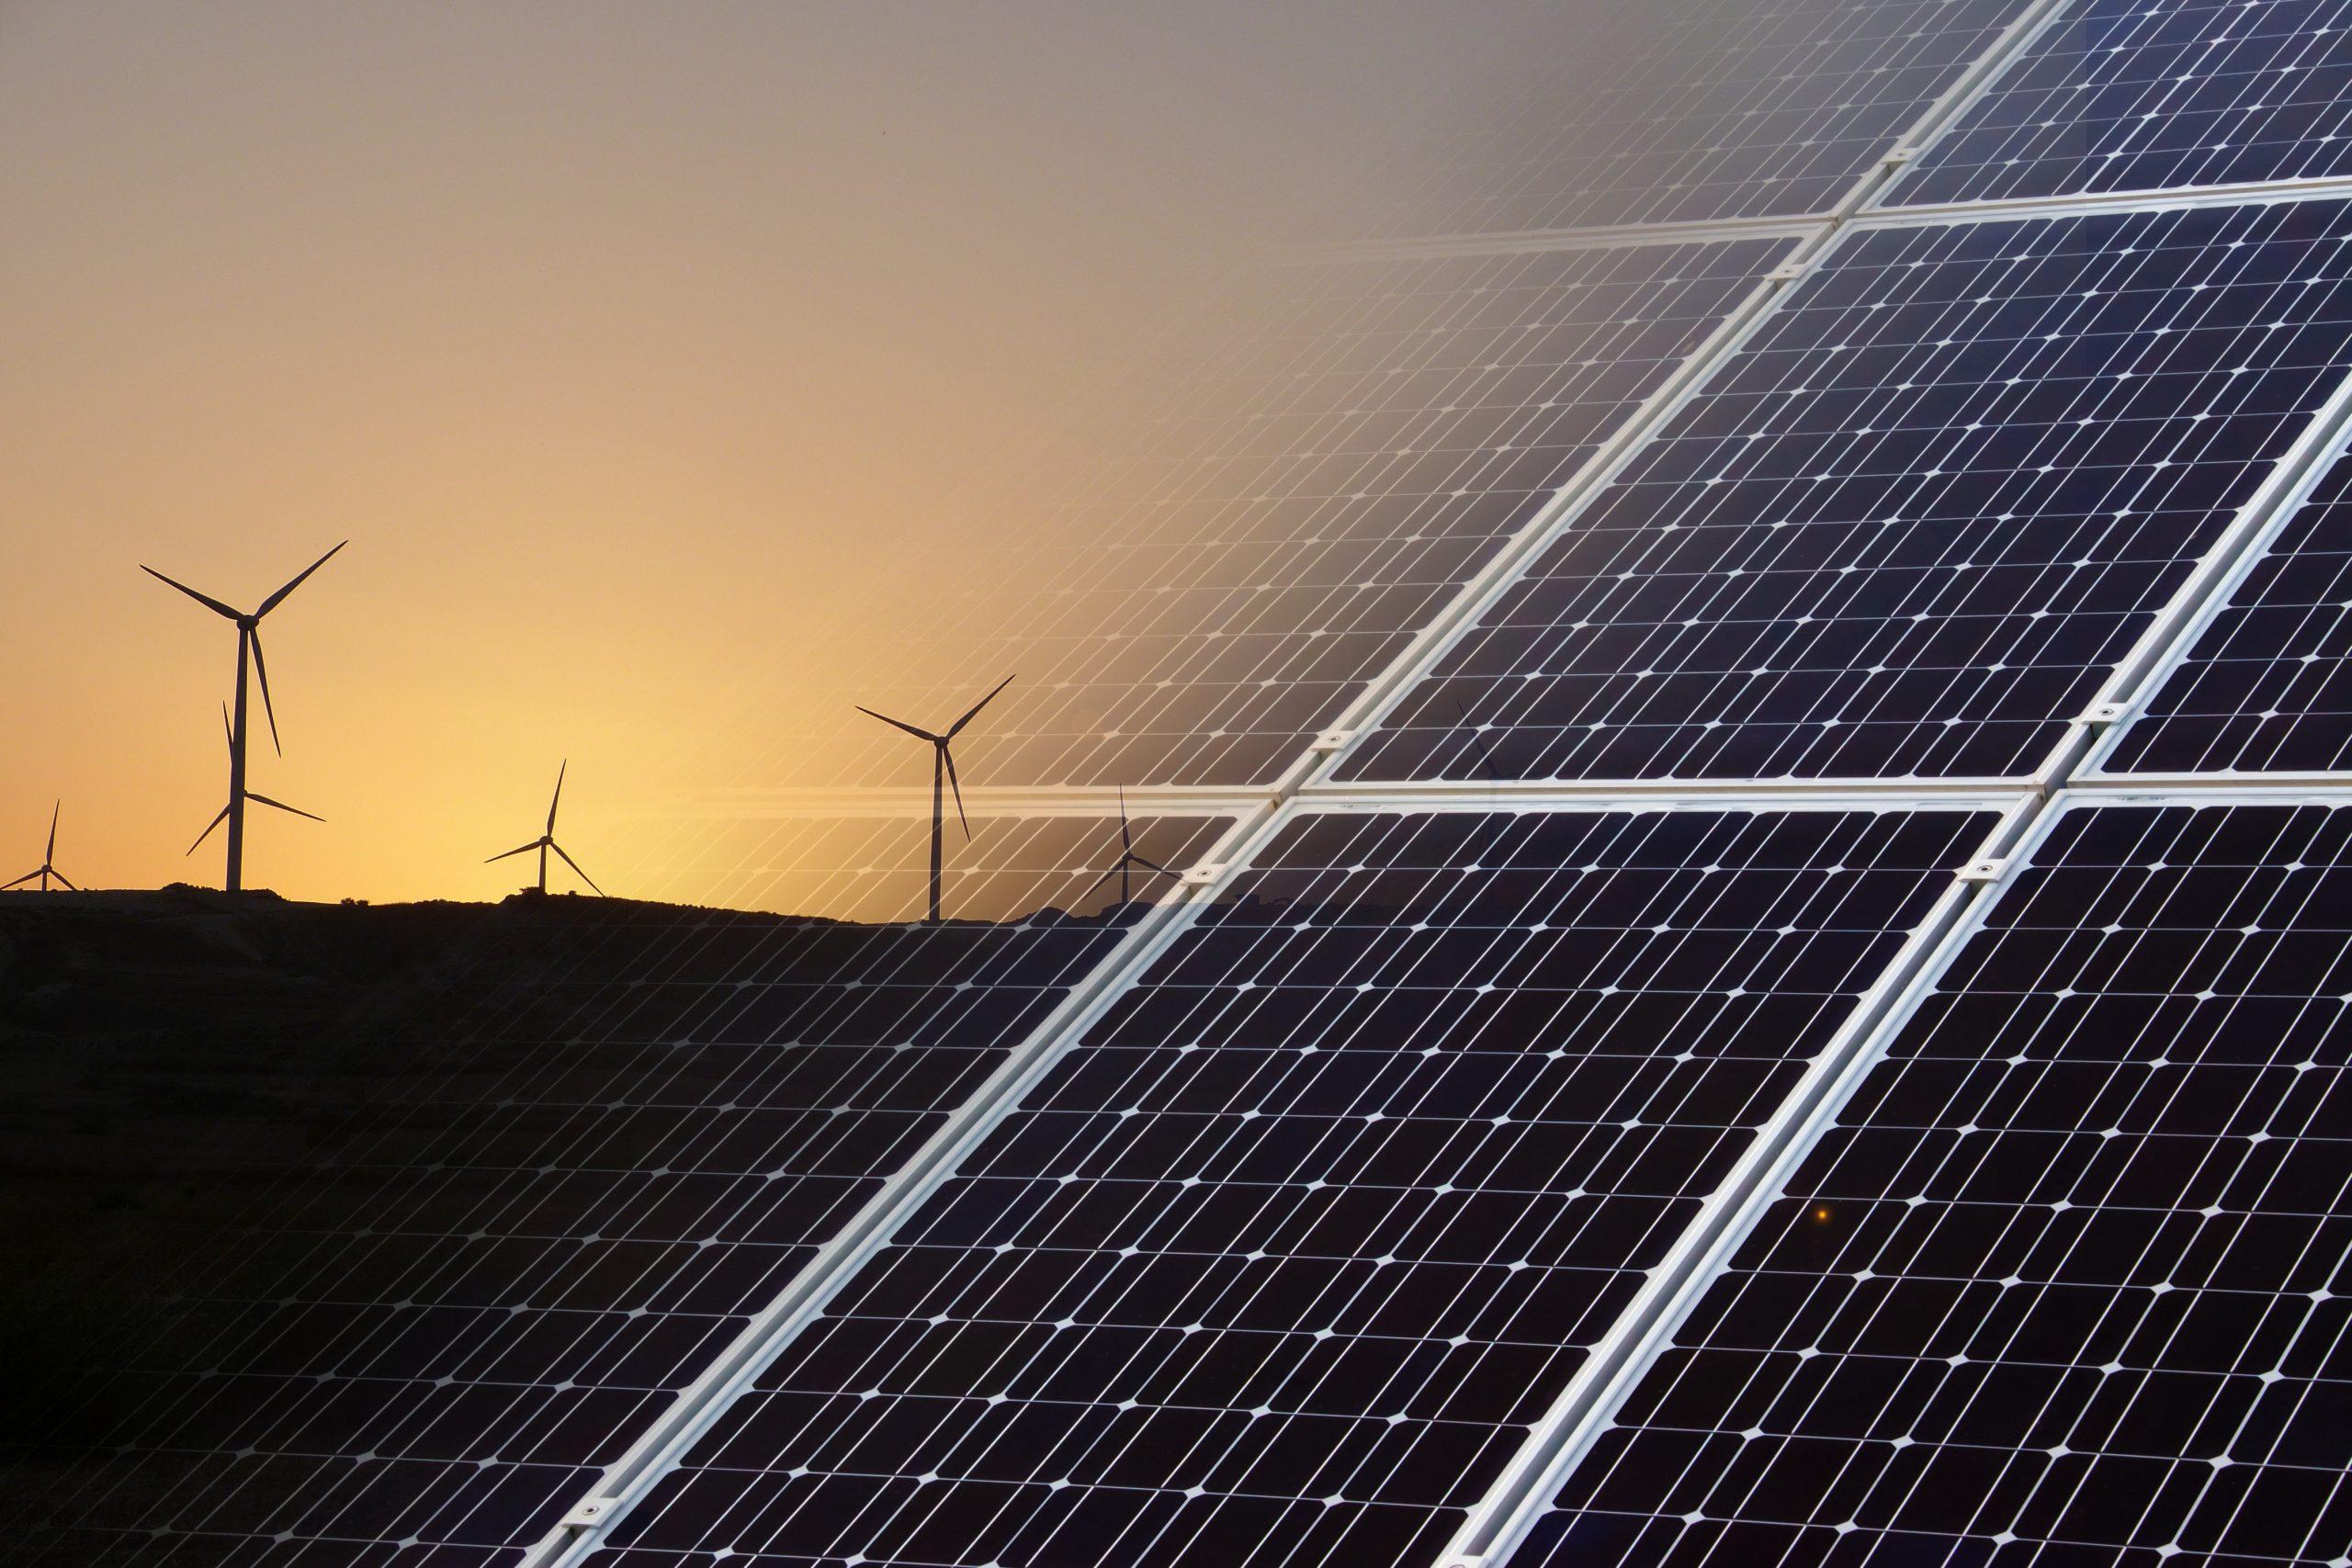 AleaSoft - renewables solar panels windmills